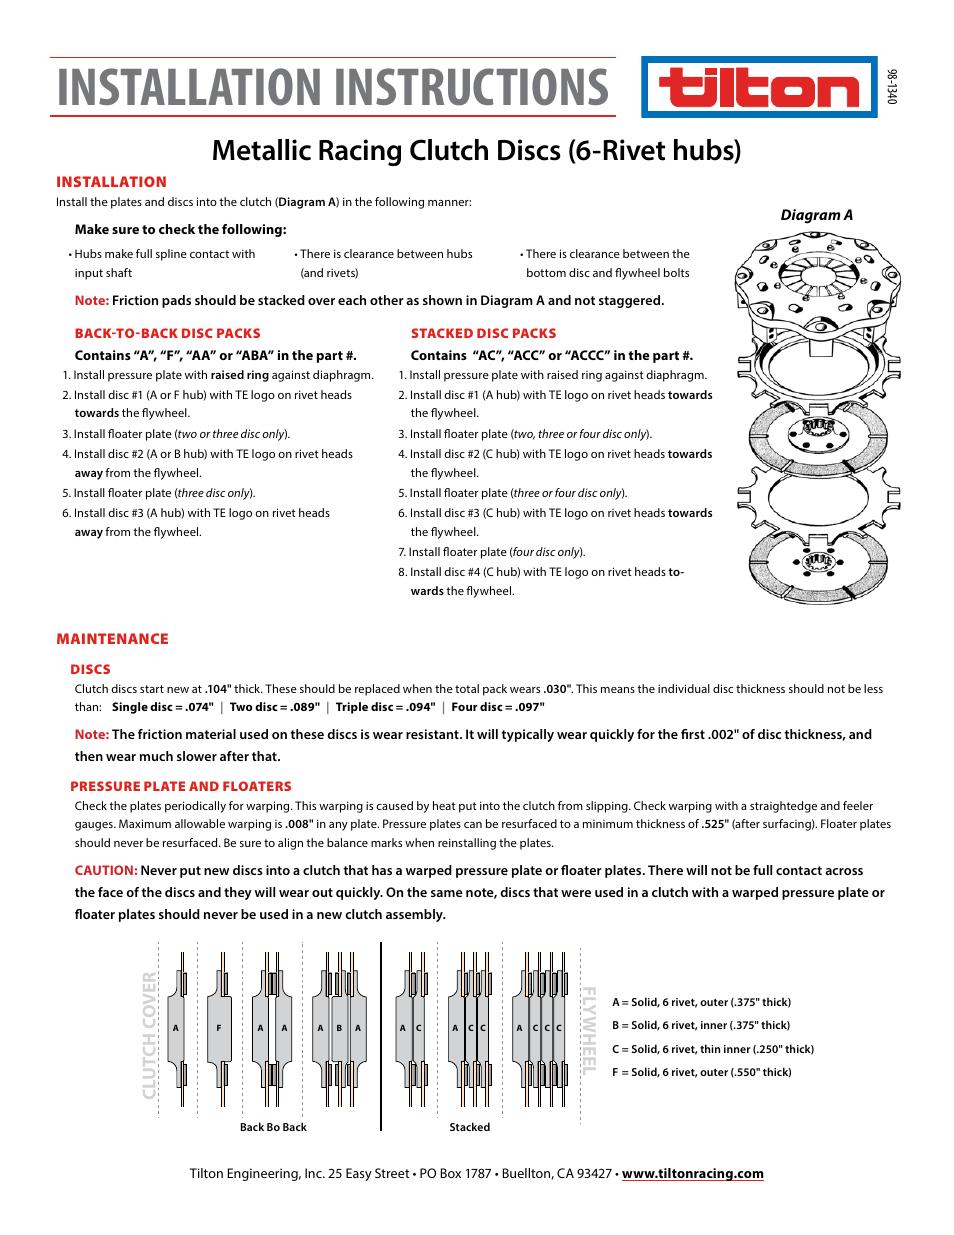 Tilton 6 Rivet Metallic Discs 98 1340 User Manual 1 Page Back Disc Diagram